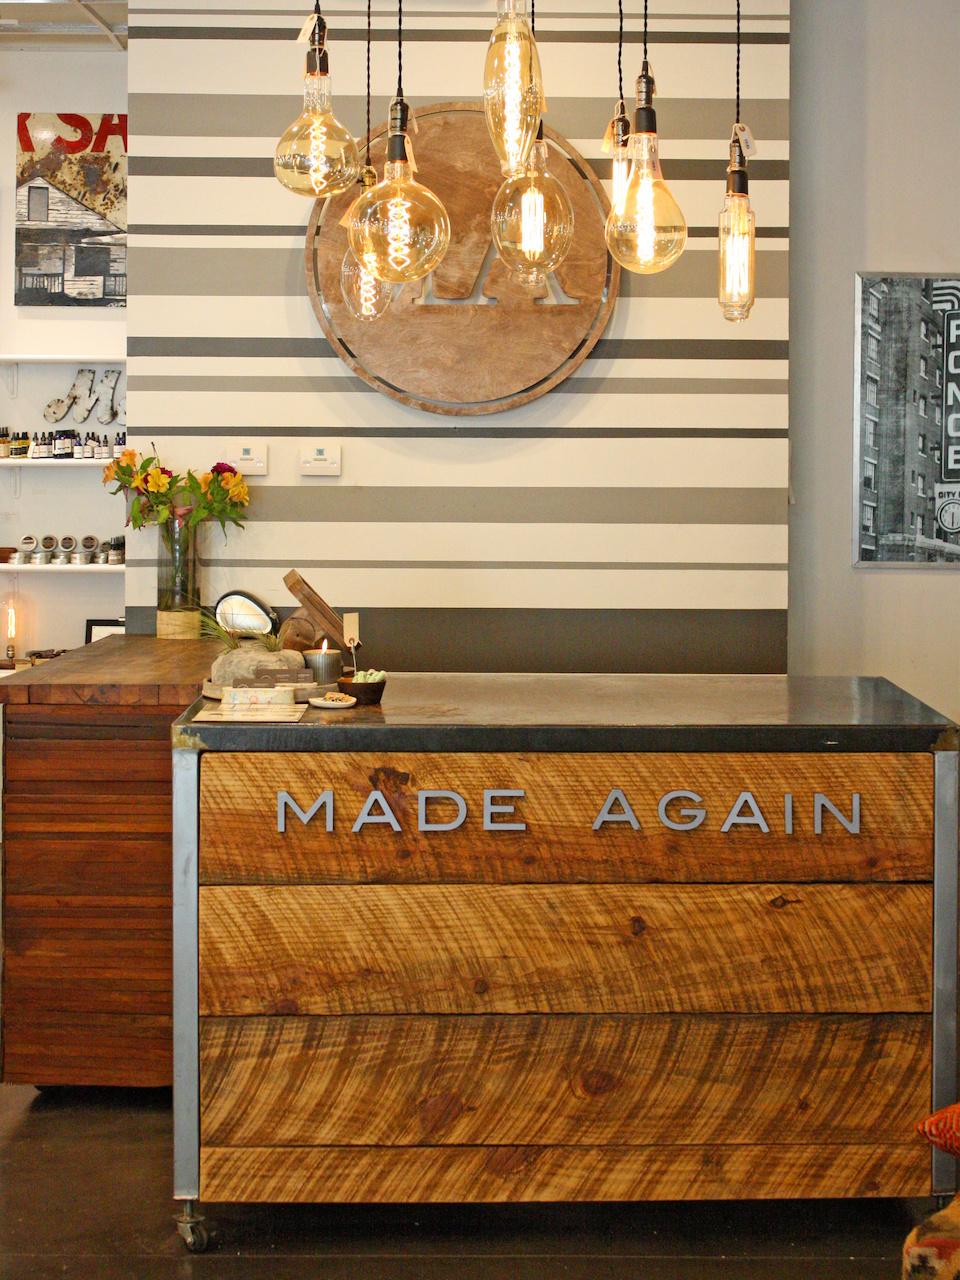 Made Again StyleBlueprint Atlanta storefront